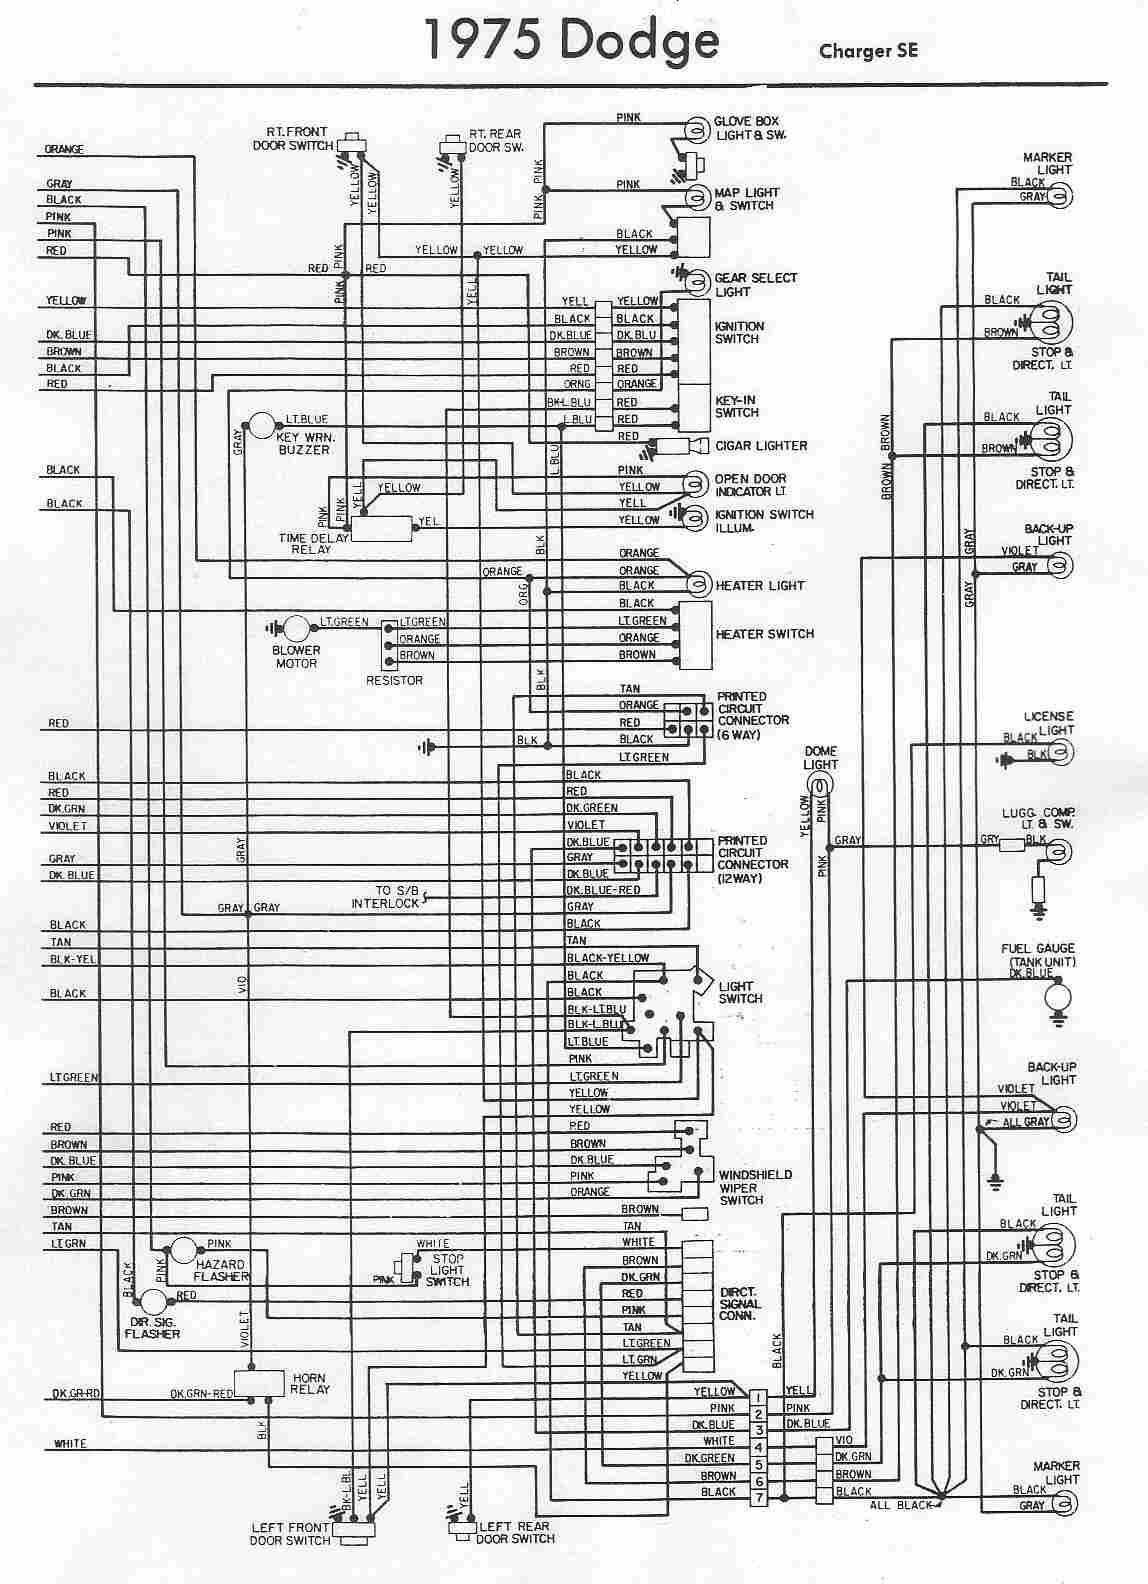 318 engine wiring diagram 2 10 sandybloom nl u2022318 engine electrical diagram online wiring diagram [ 1148 x 1584 Pixel ]